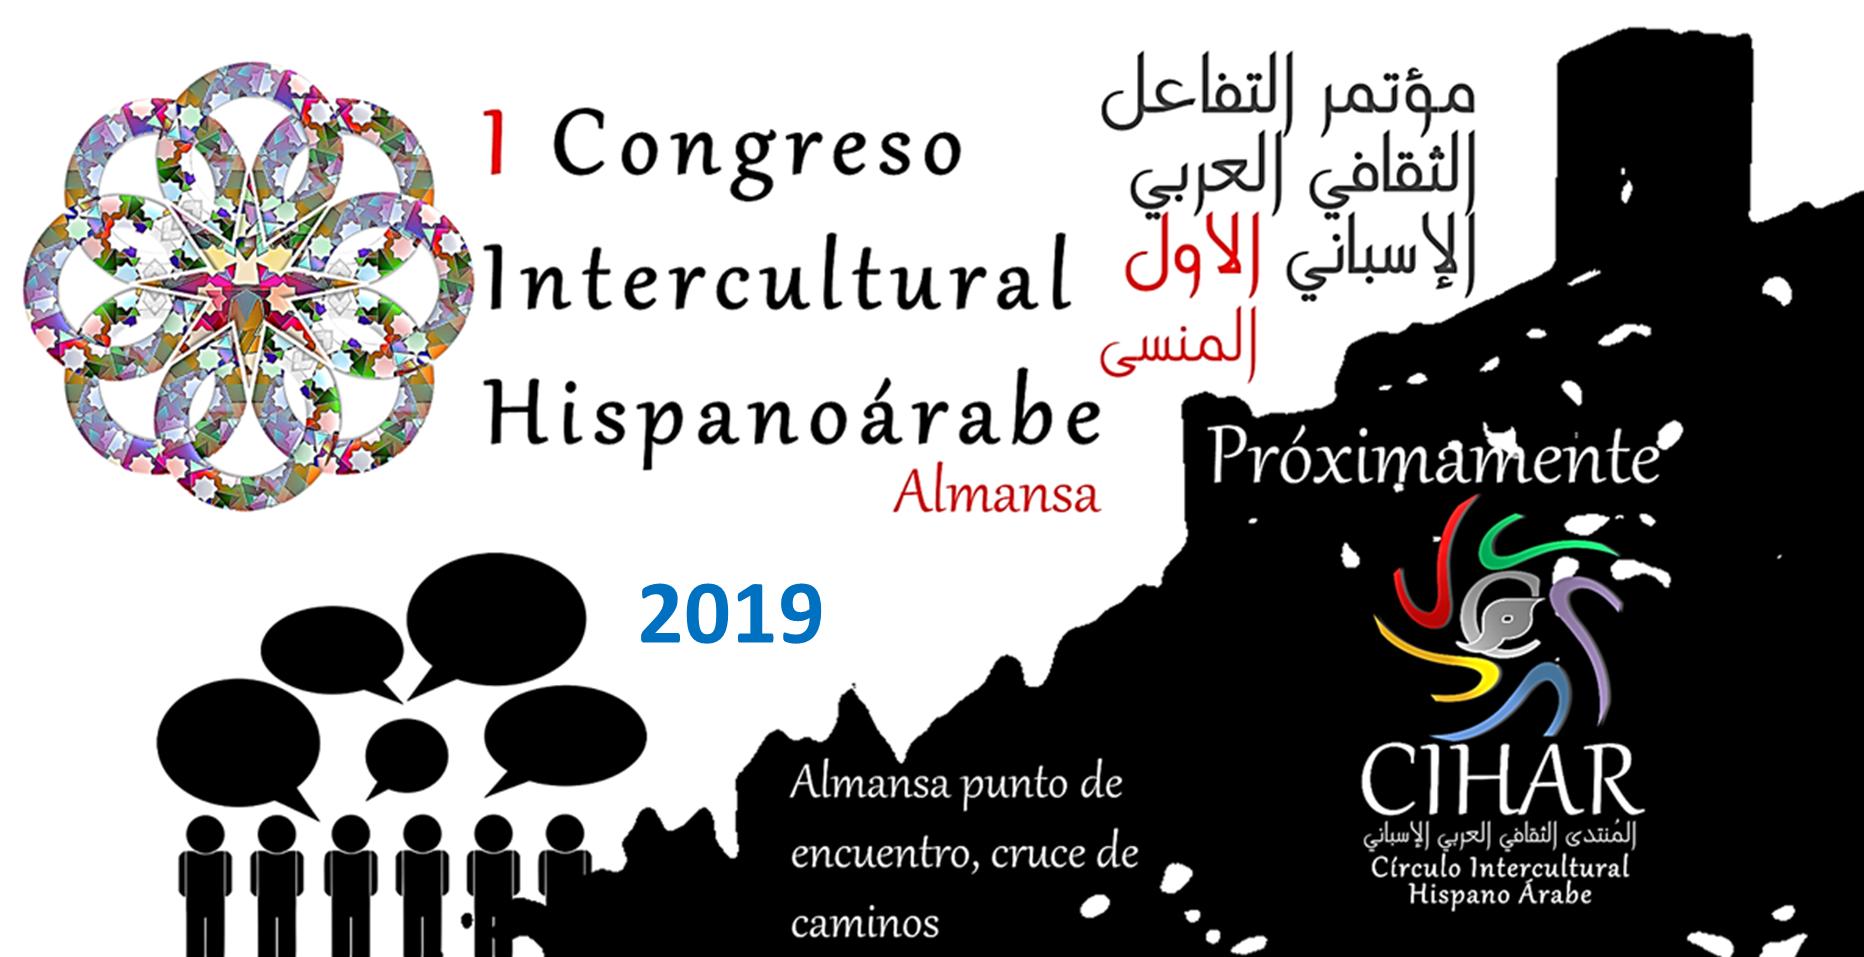 I Congreso Intercultural Hispanoárabe – Almansa / Albacete